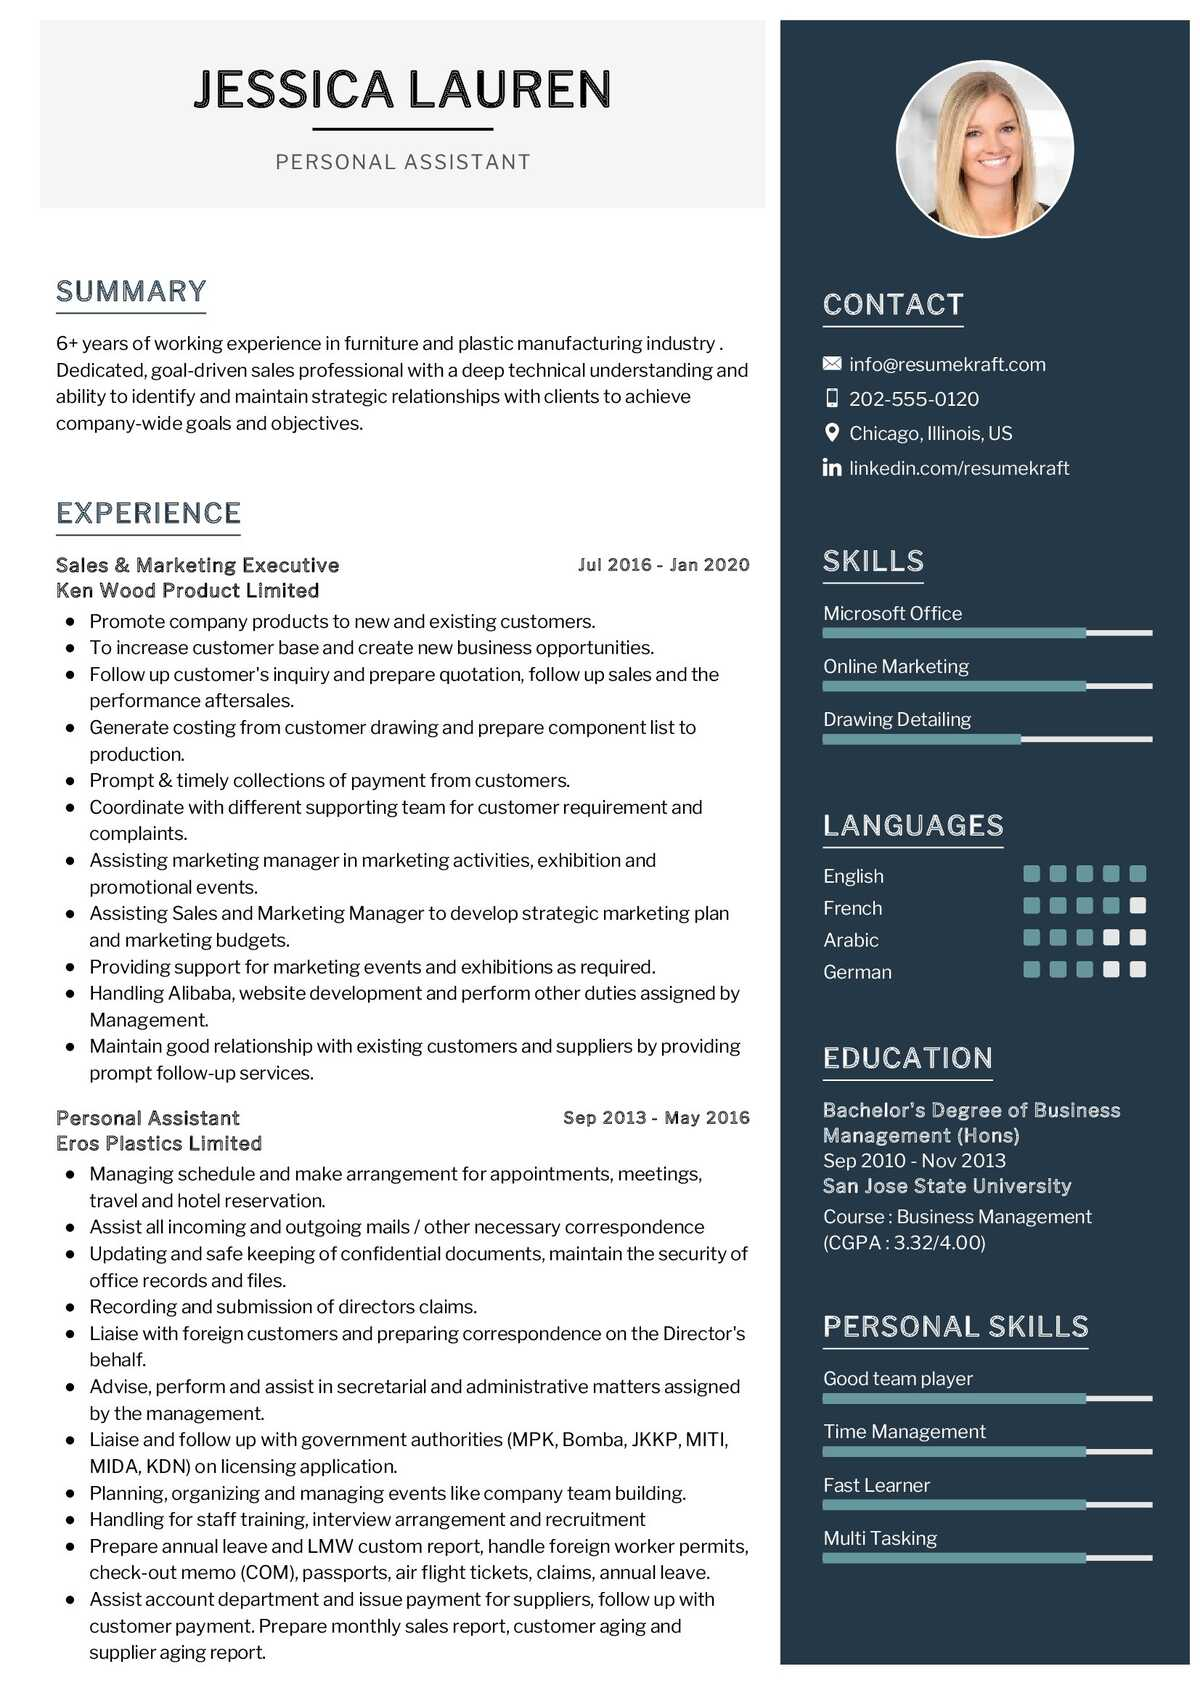 Resume and san jose custom dissertation proposal writer websites for phd